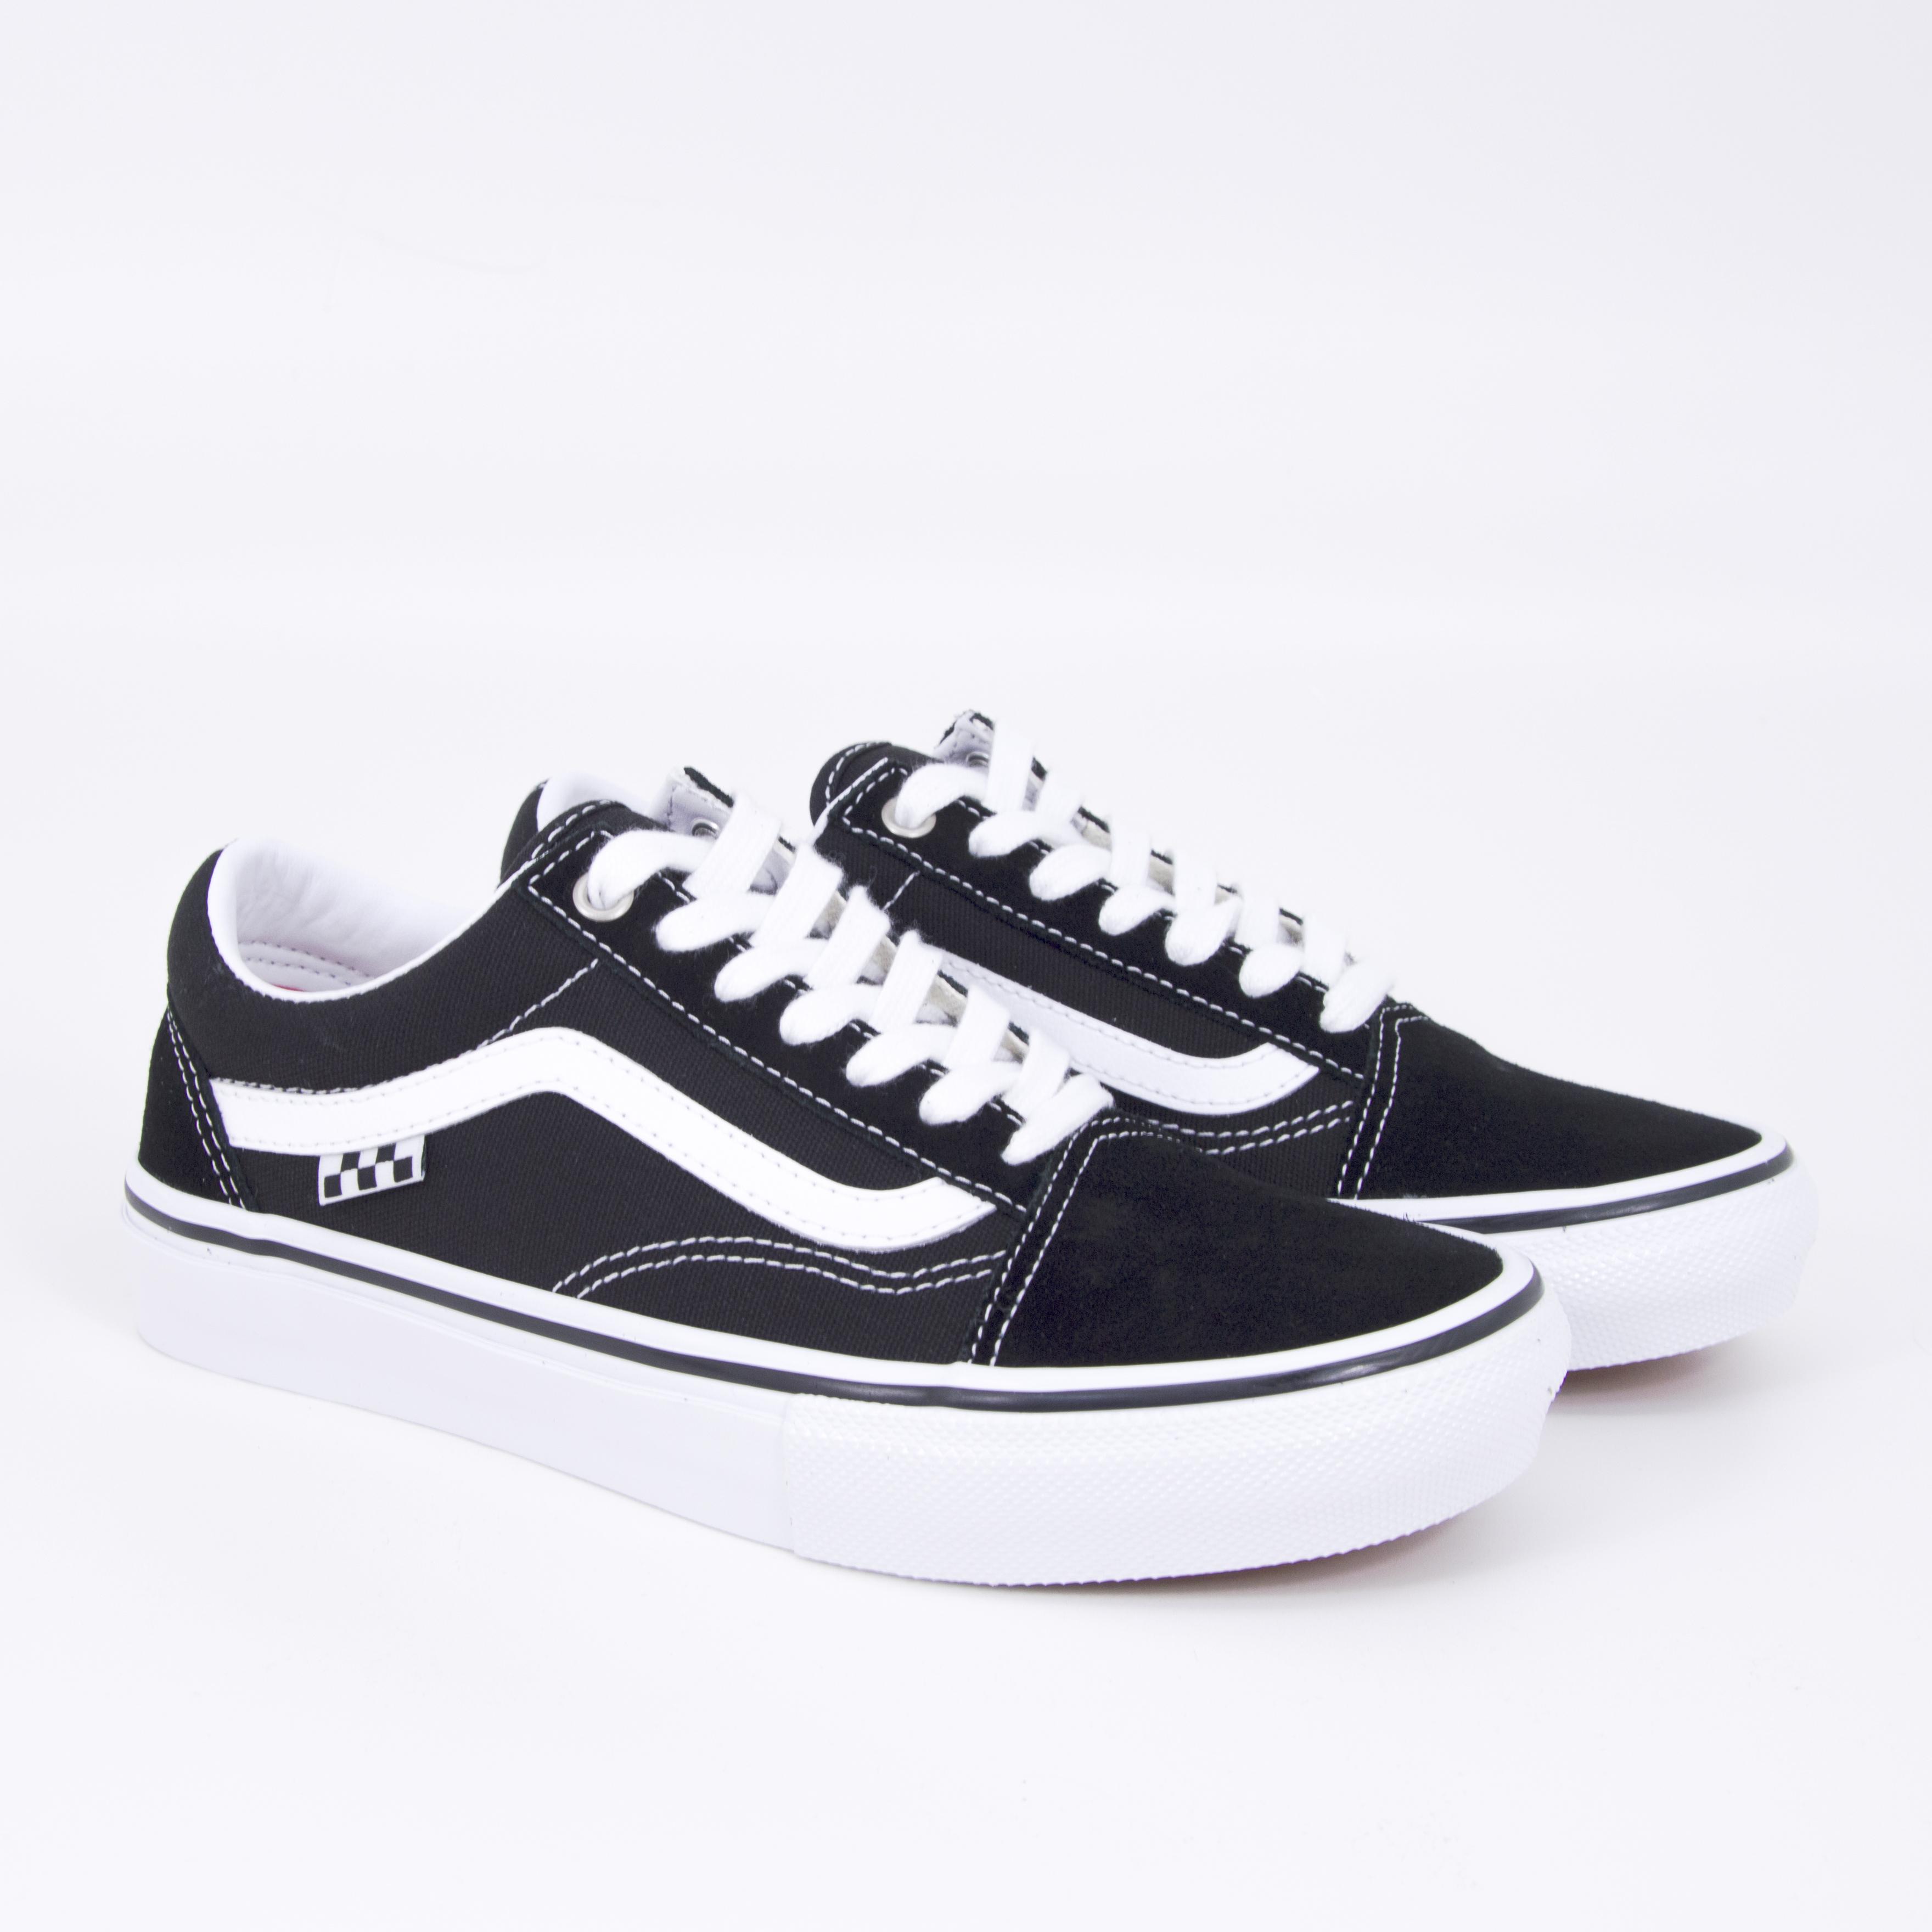 Vans - SKATE OLD SKOOL - Black/White